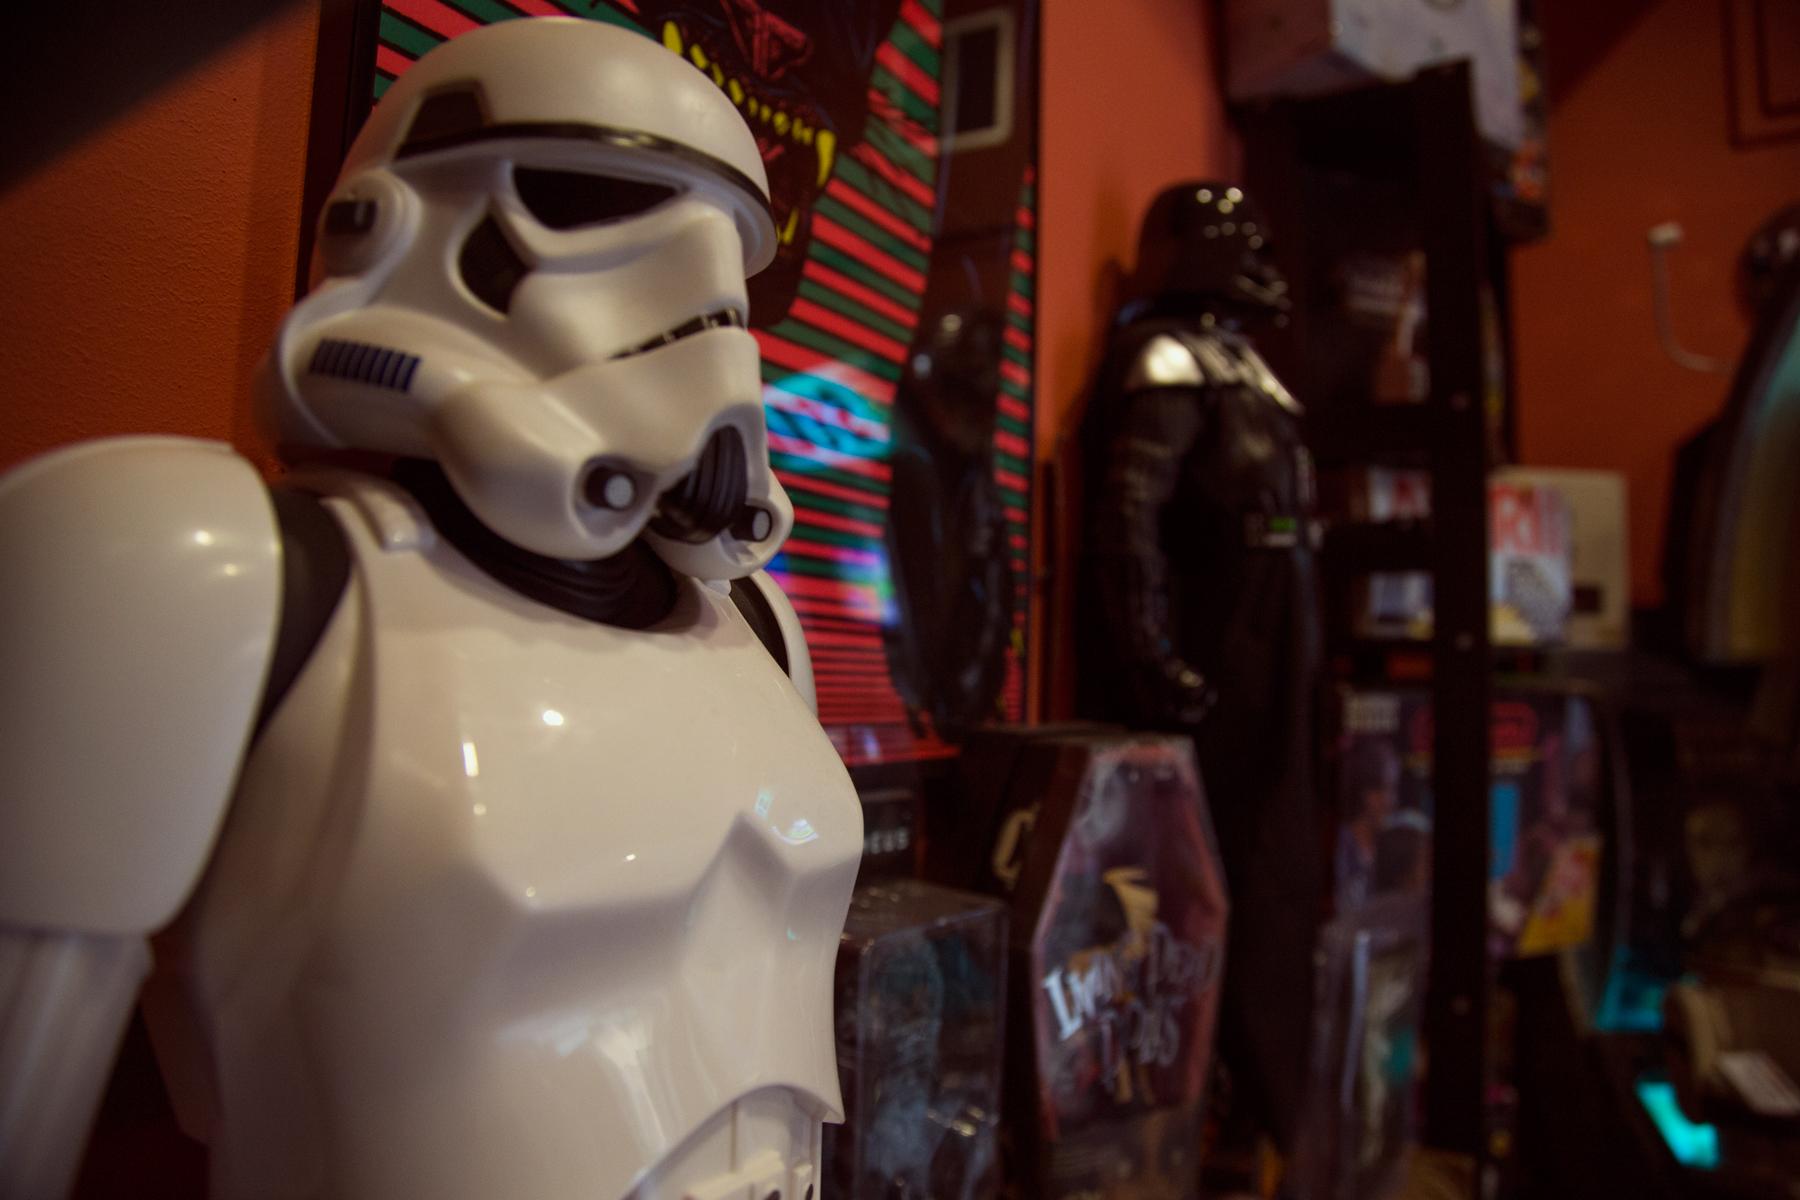 Stormtrooper & Darth Vader keepin' it real since 1977 (τα συγκεκριμένα figures είναι επανεκδόσεις του 2015 βέβαια)